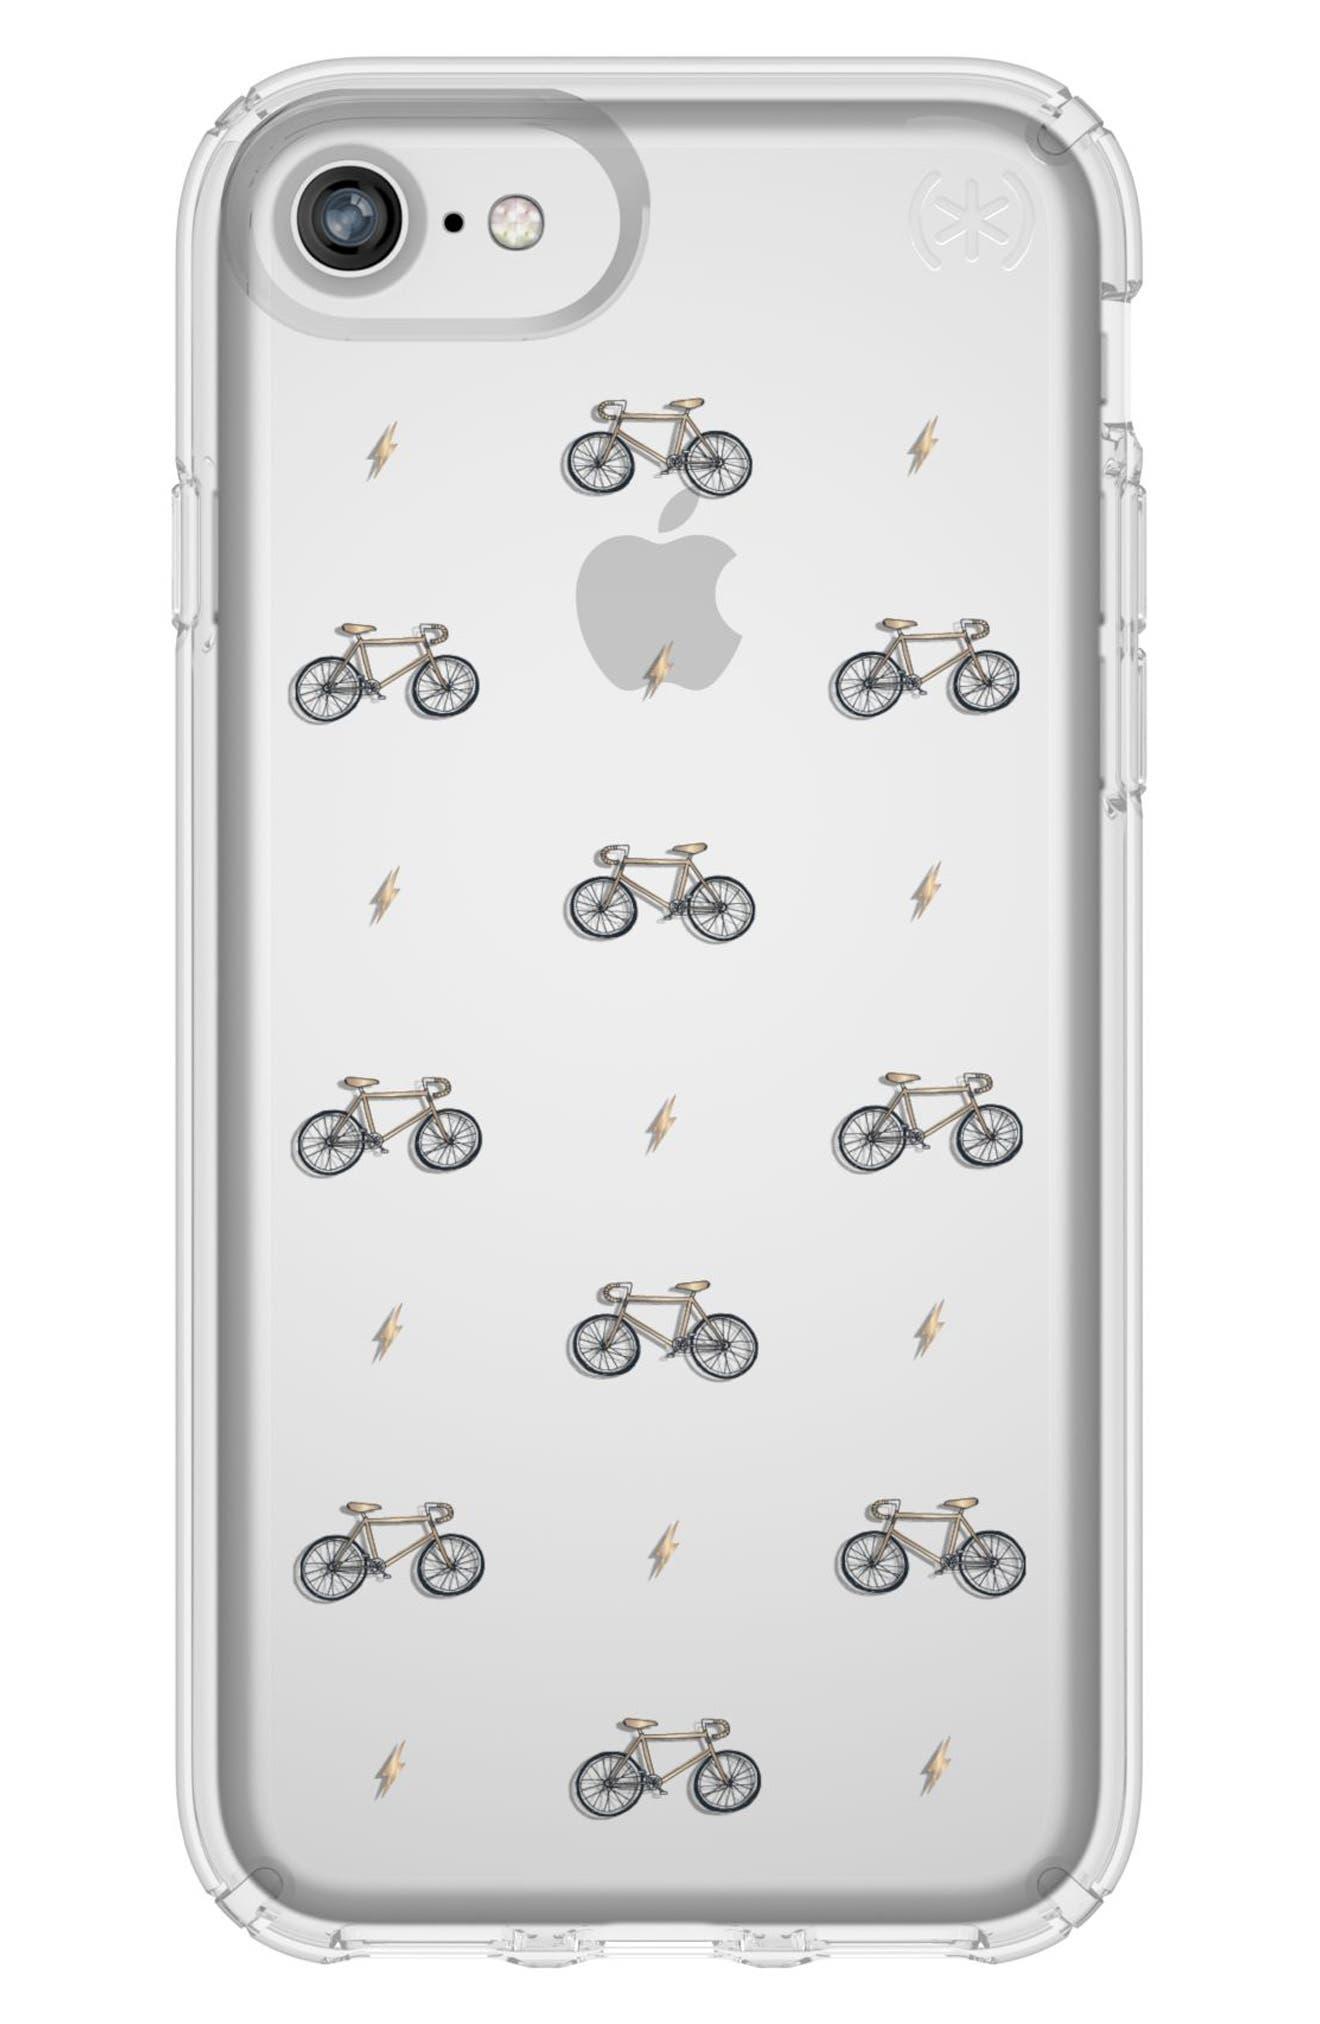 Main Image - Speck Transparent Bikes & Bolts iPhone 6/6s/7/8 Case